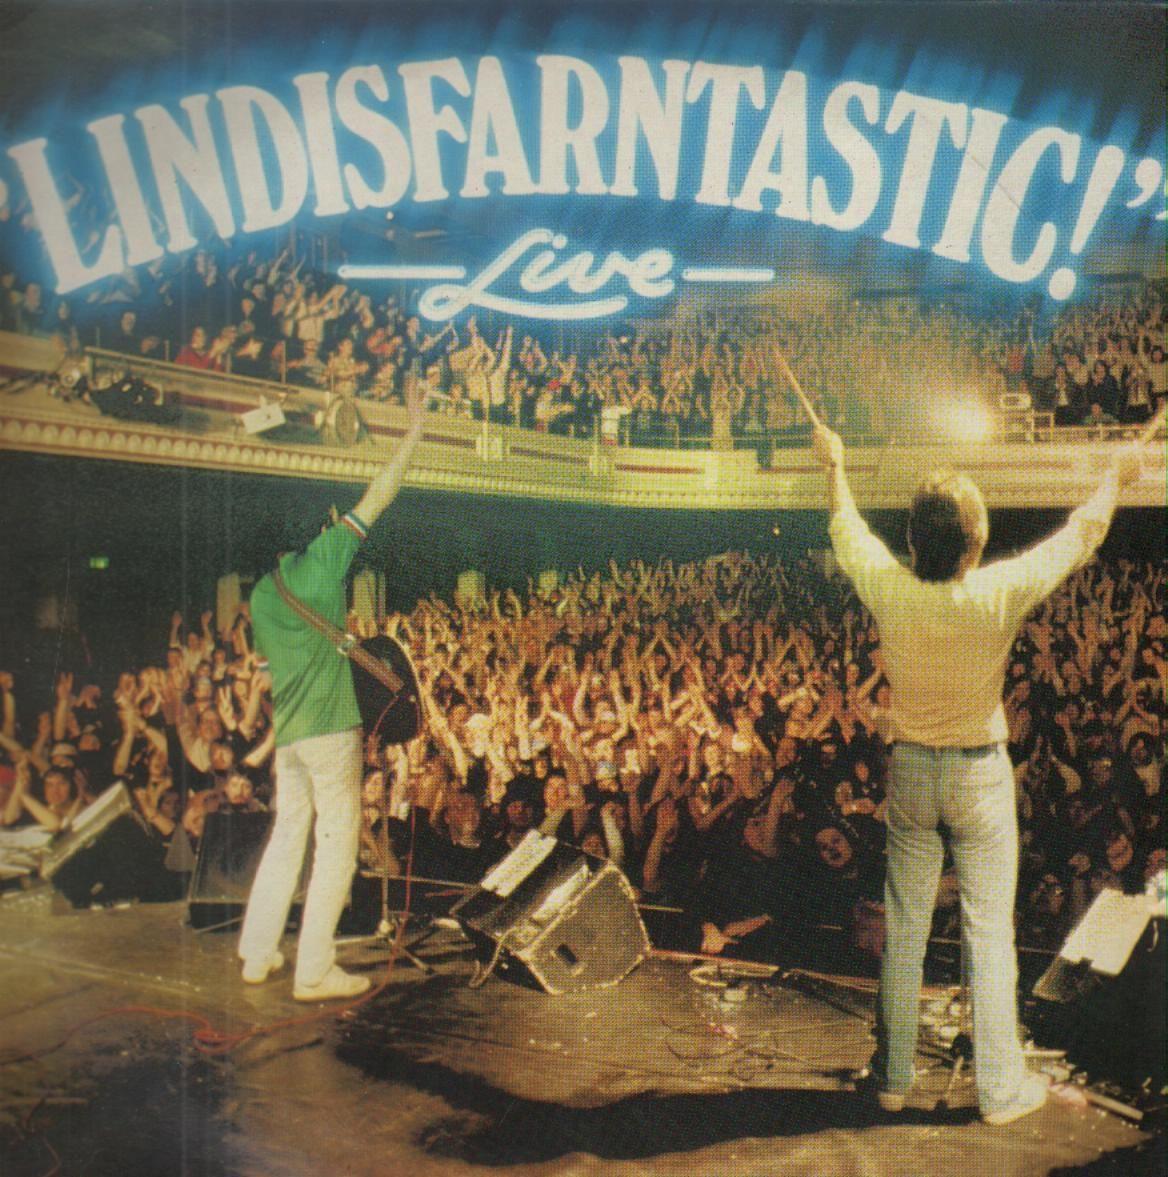 Lindisfarne Lindisfarntastic! Live